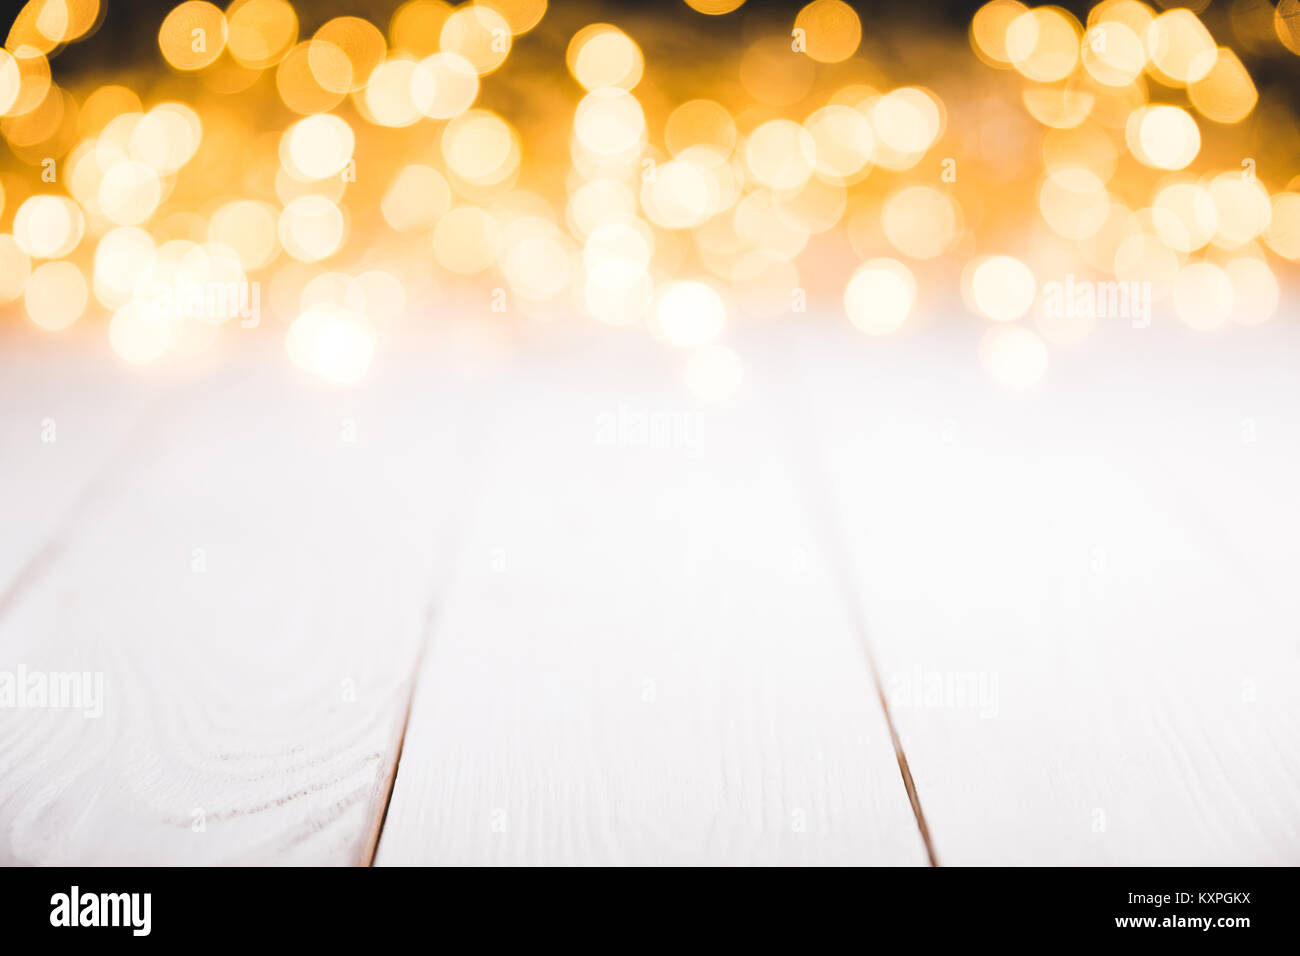 Mágicas luces borrosa sobre superficie de madera blanca, textura de navidad Imagen De Stock